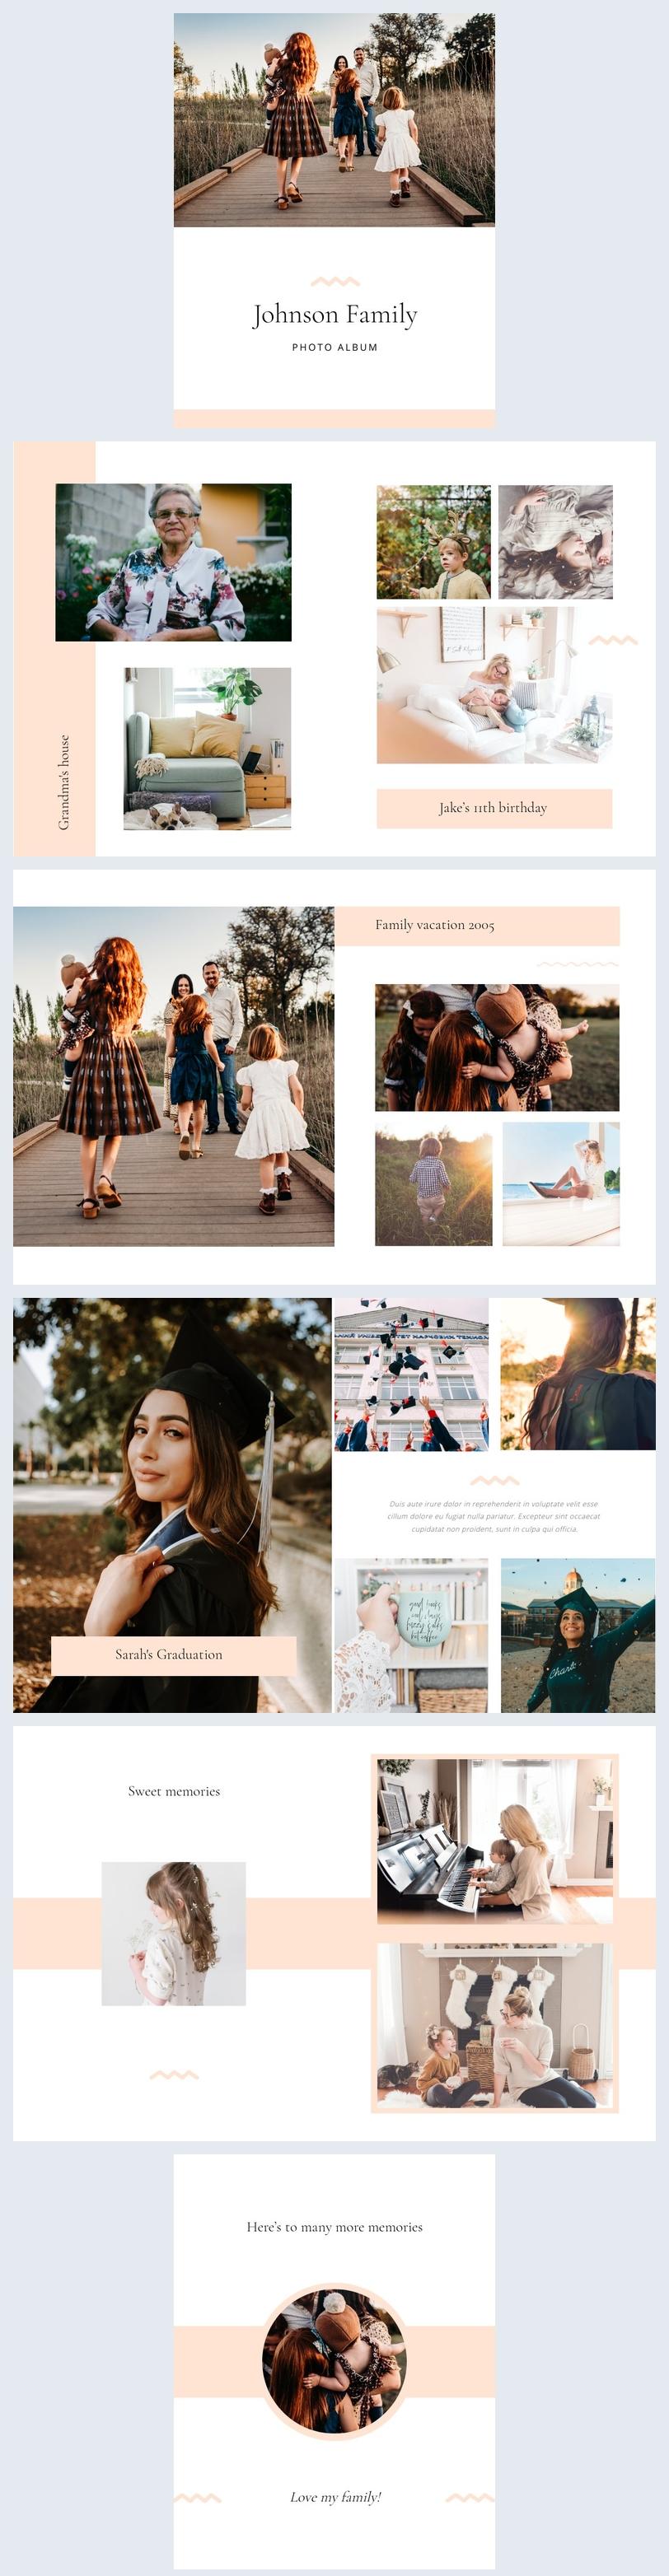 Family Photo Album Design Template Example